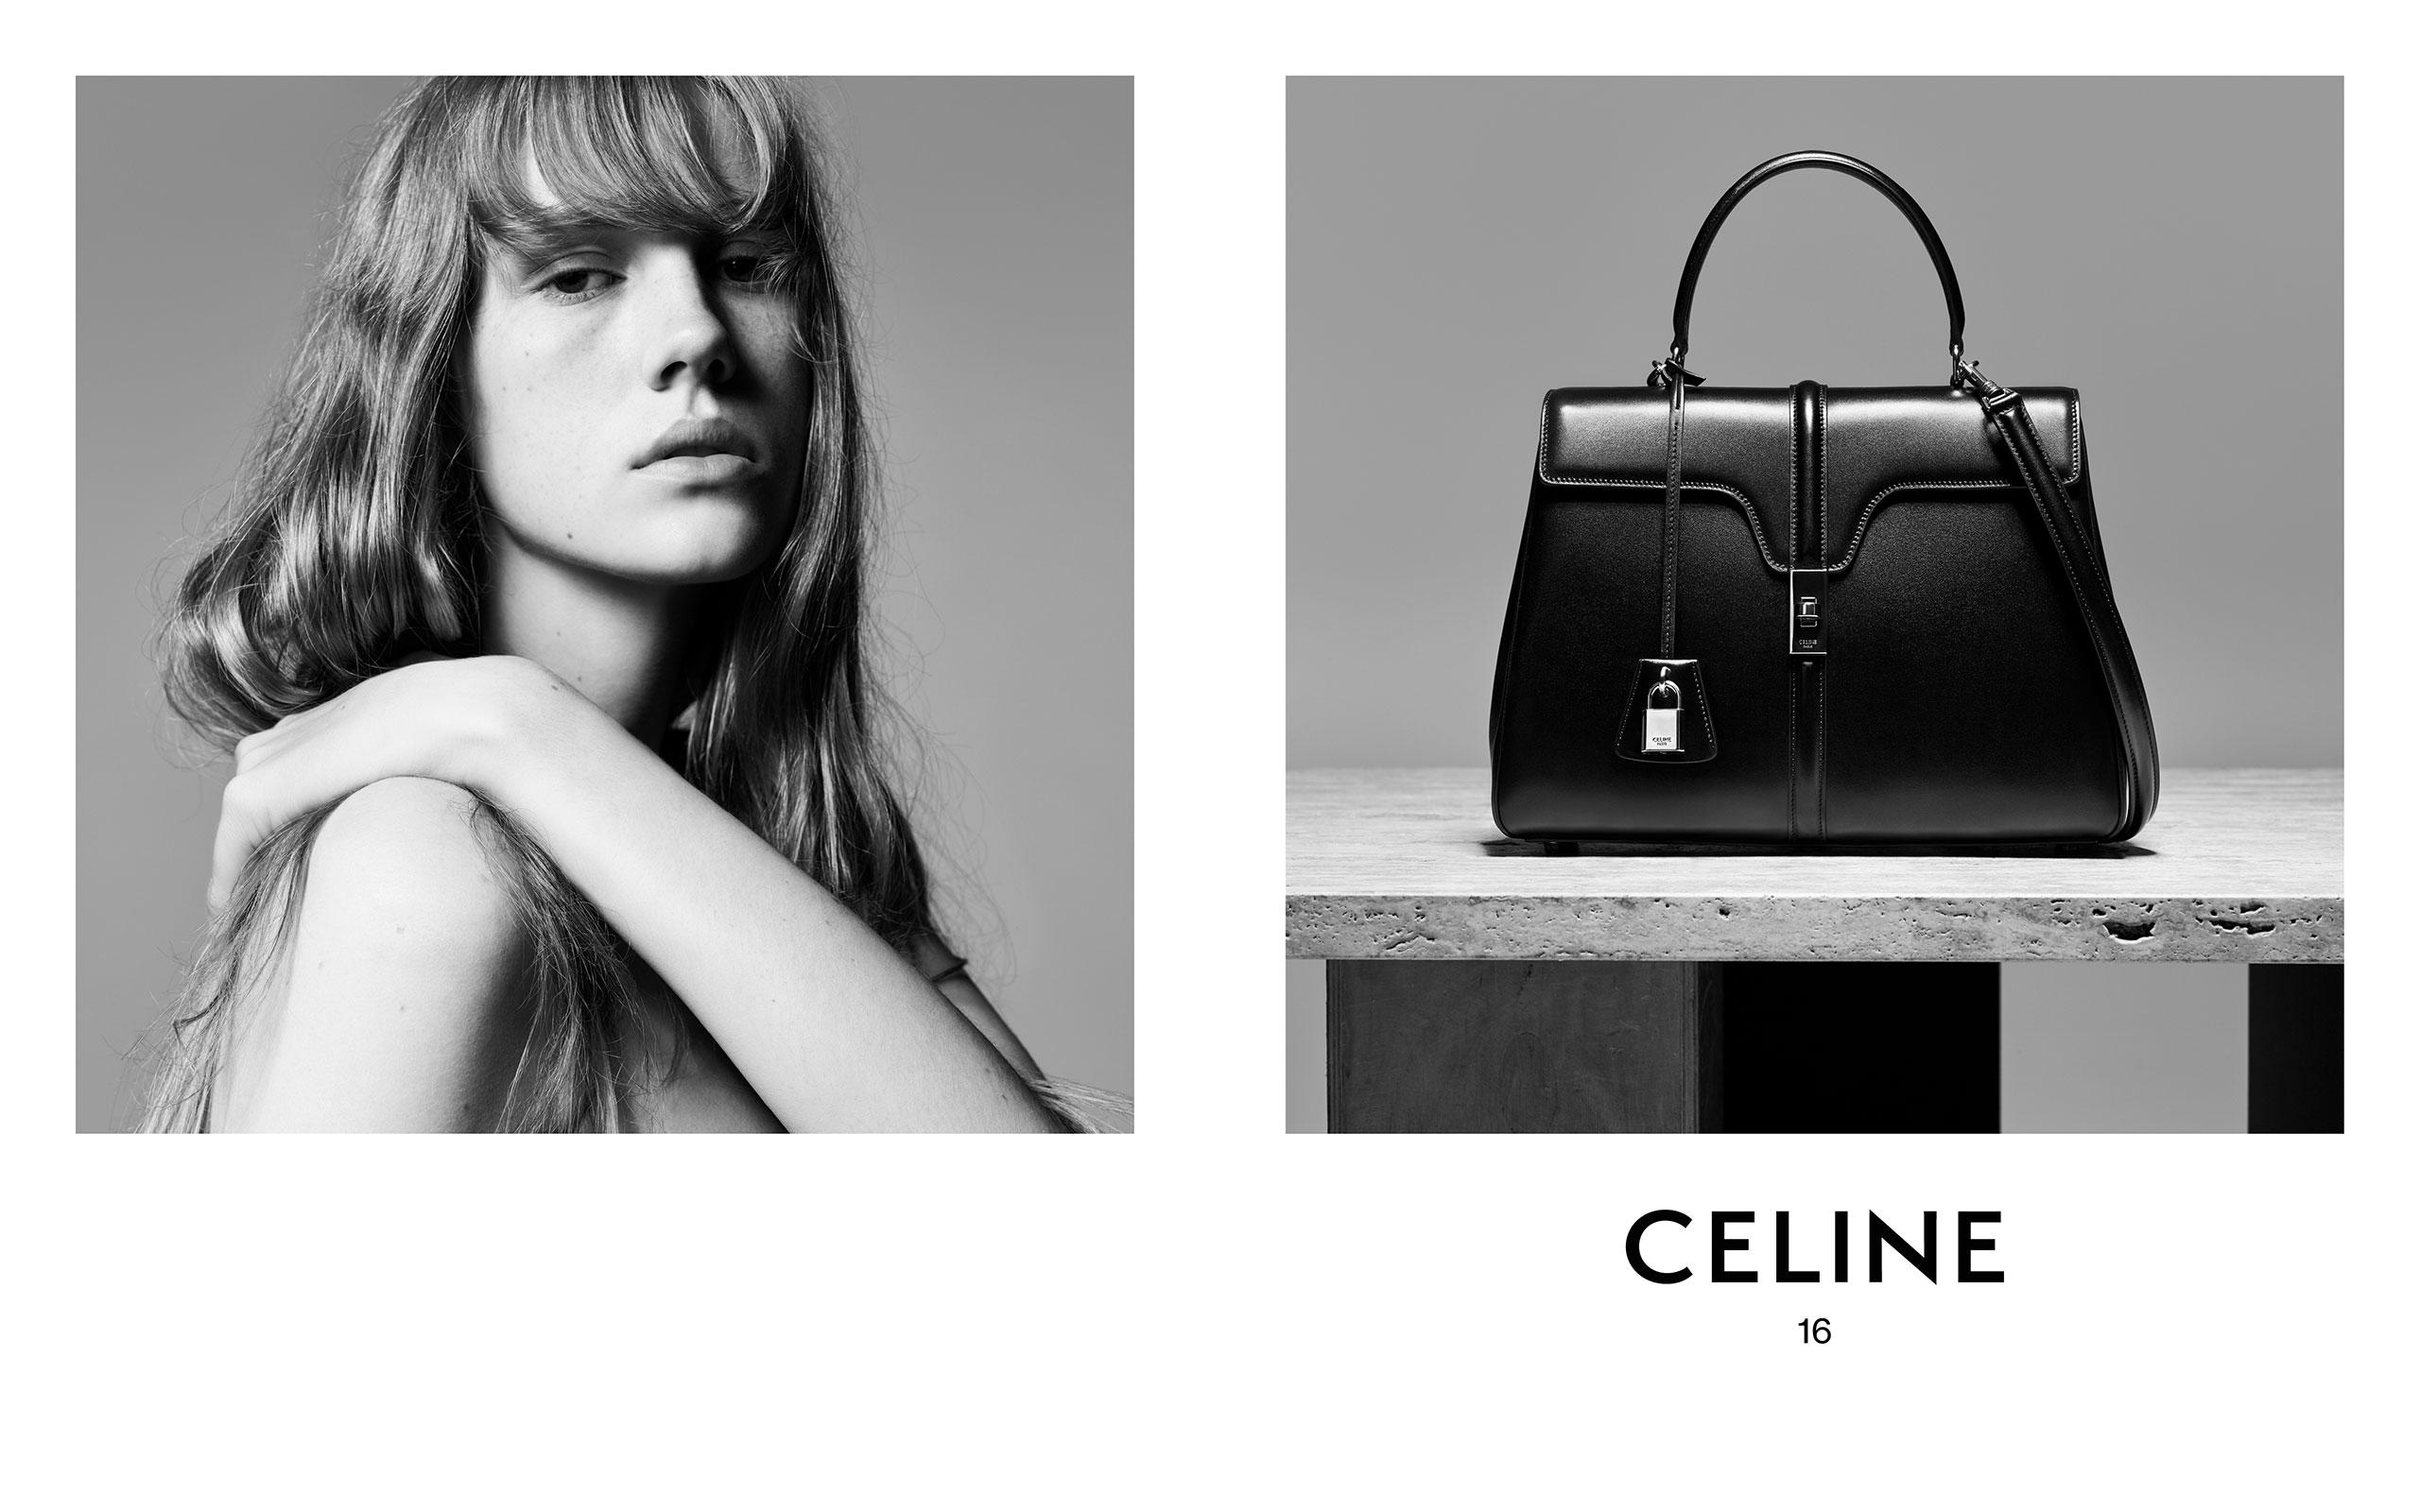 eea5f2cfdf0b Celine (セリーヌ)、Hedi Slimane (エディ・スリマン) による初めてのバッグ「16 (セーズ)」が登場